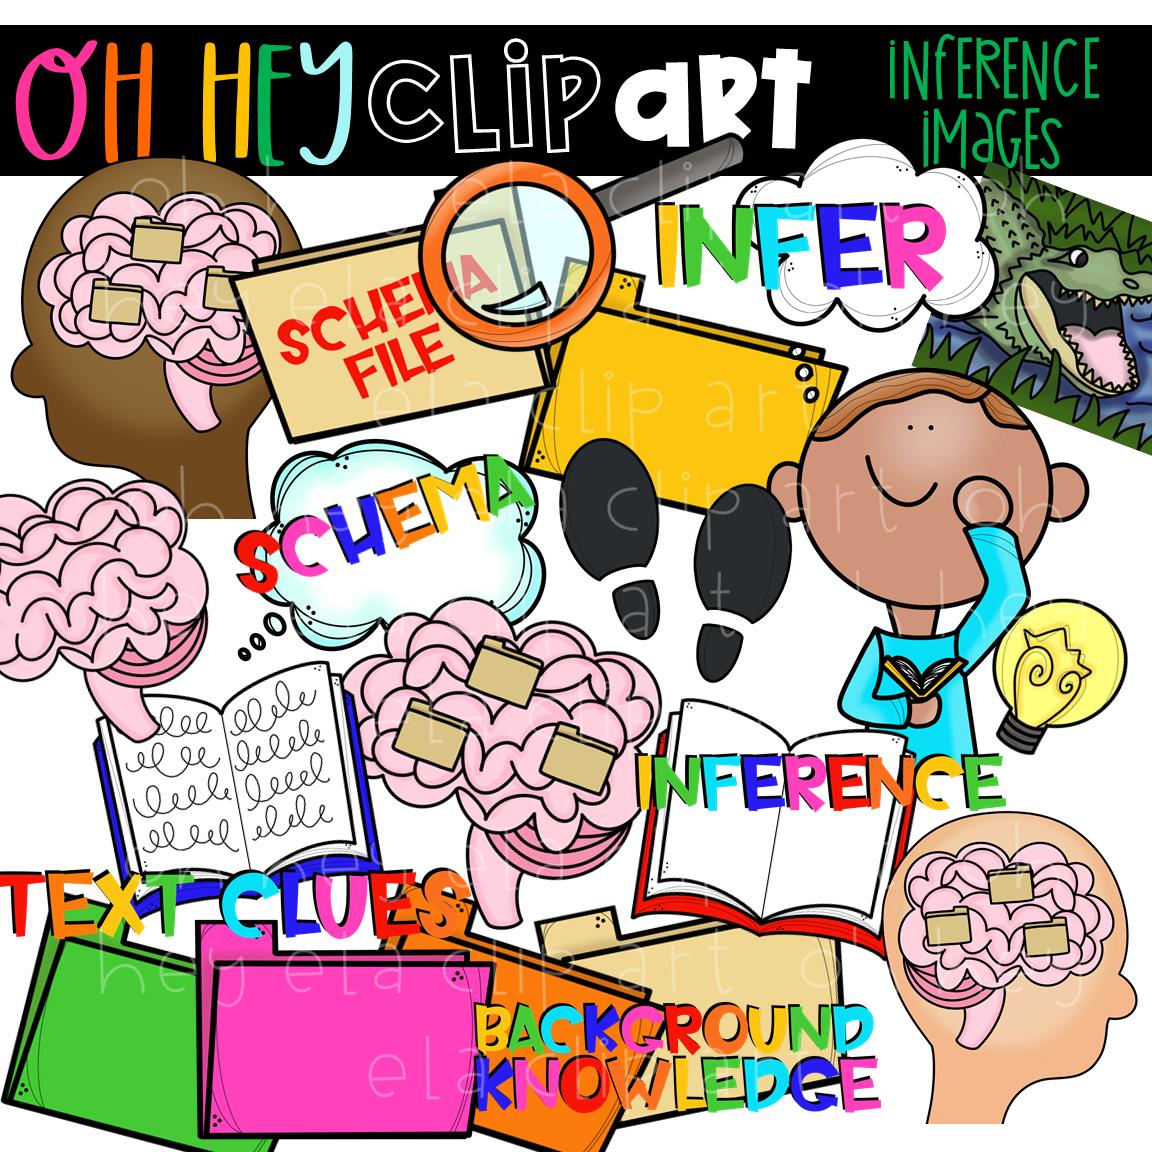 Inference Clip Art Biggame